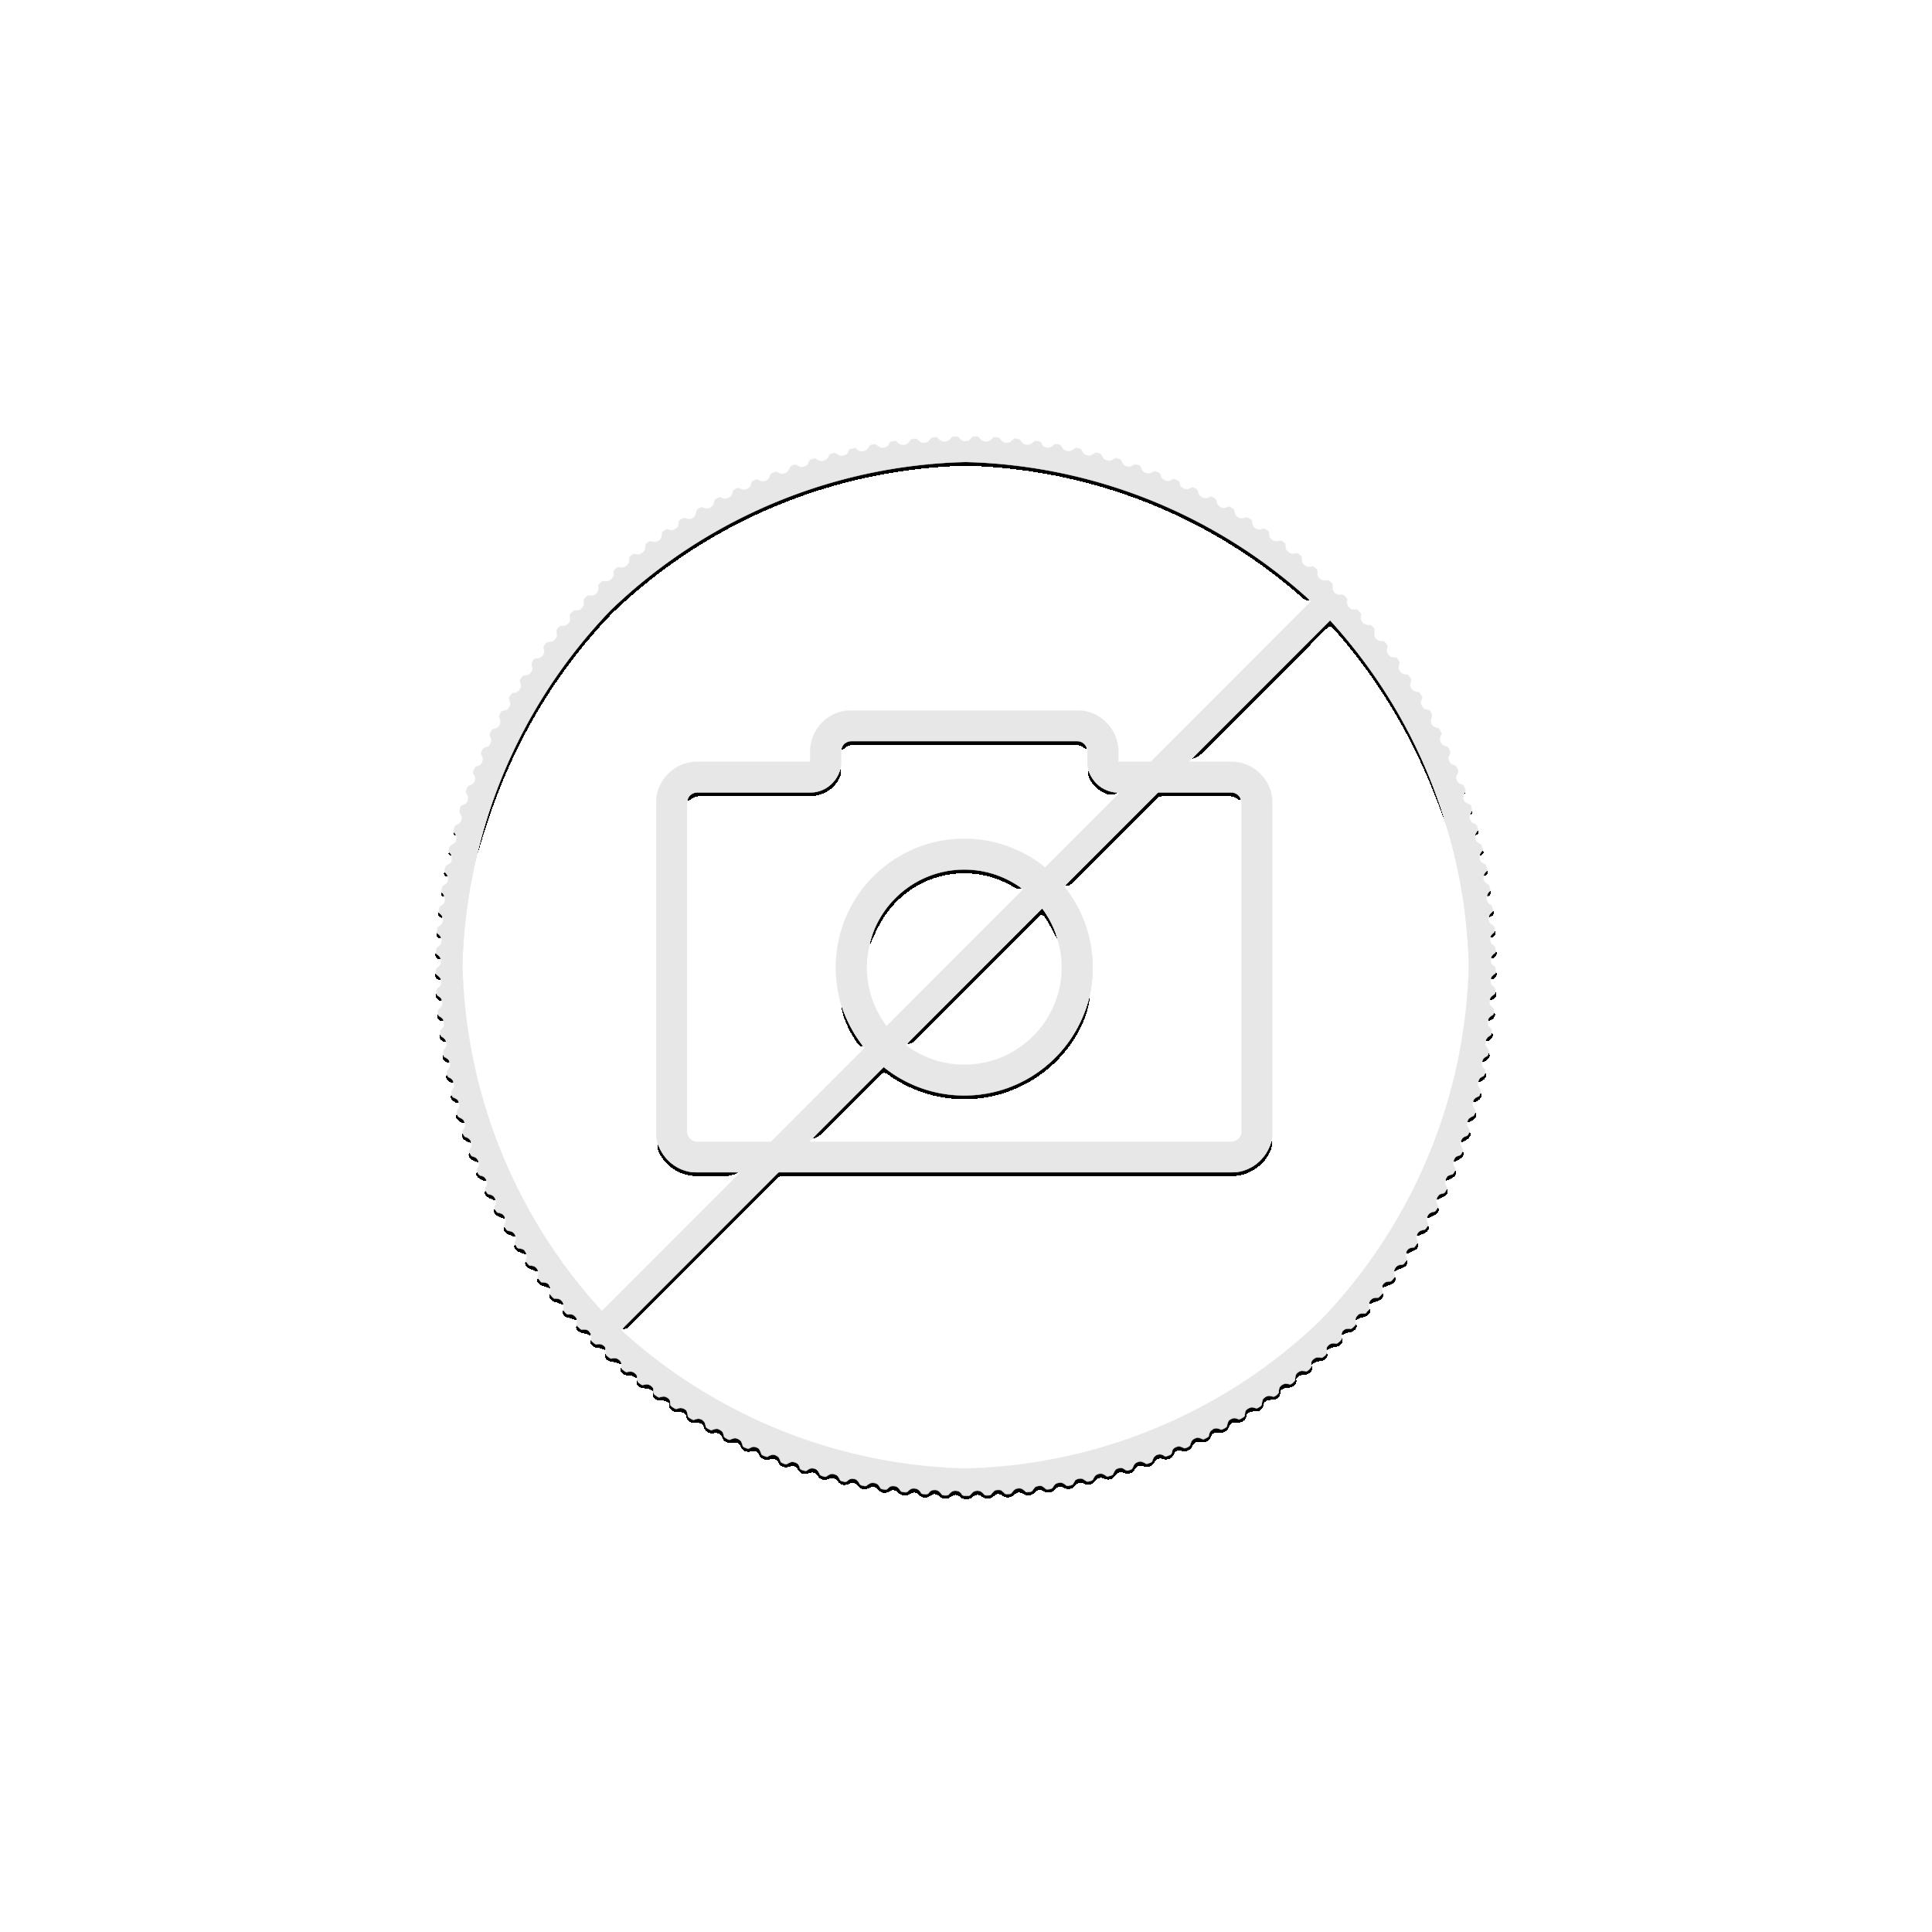 15 Gram gouden Panda munt 2017